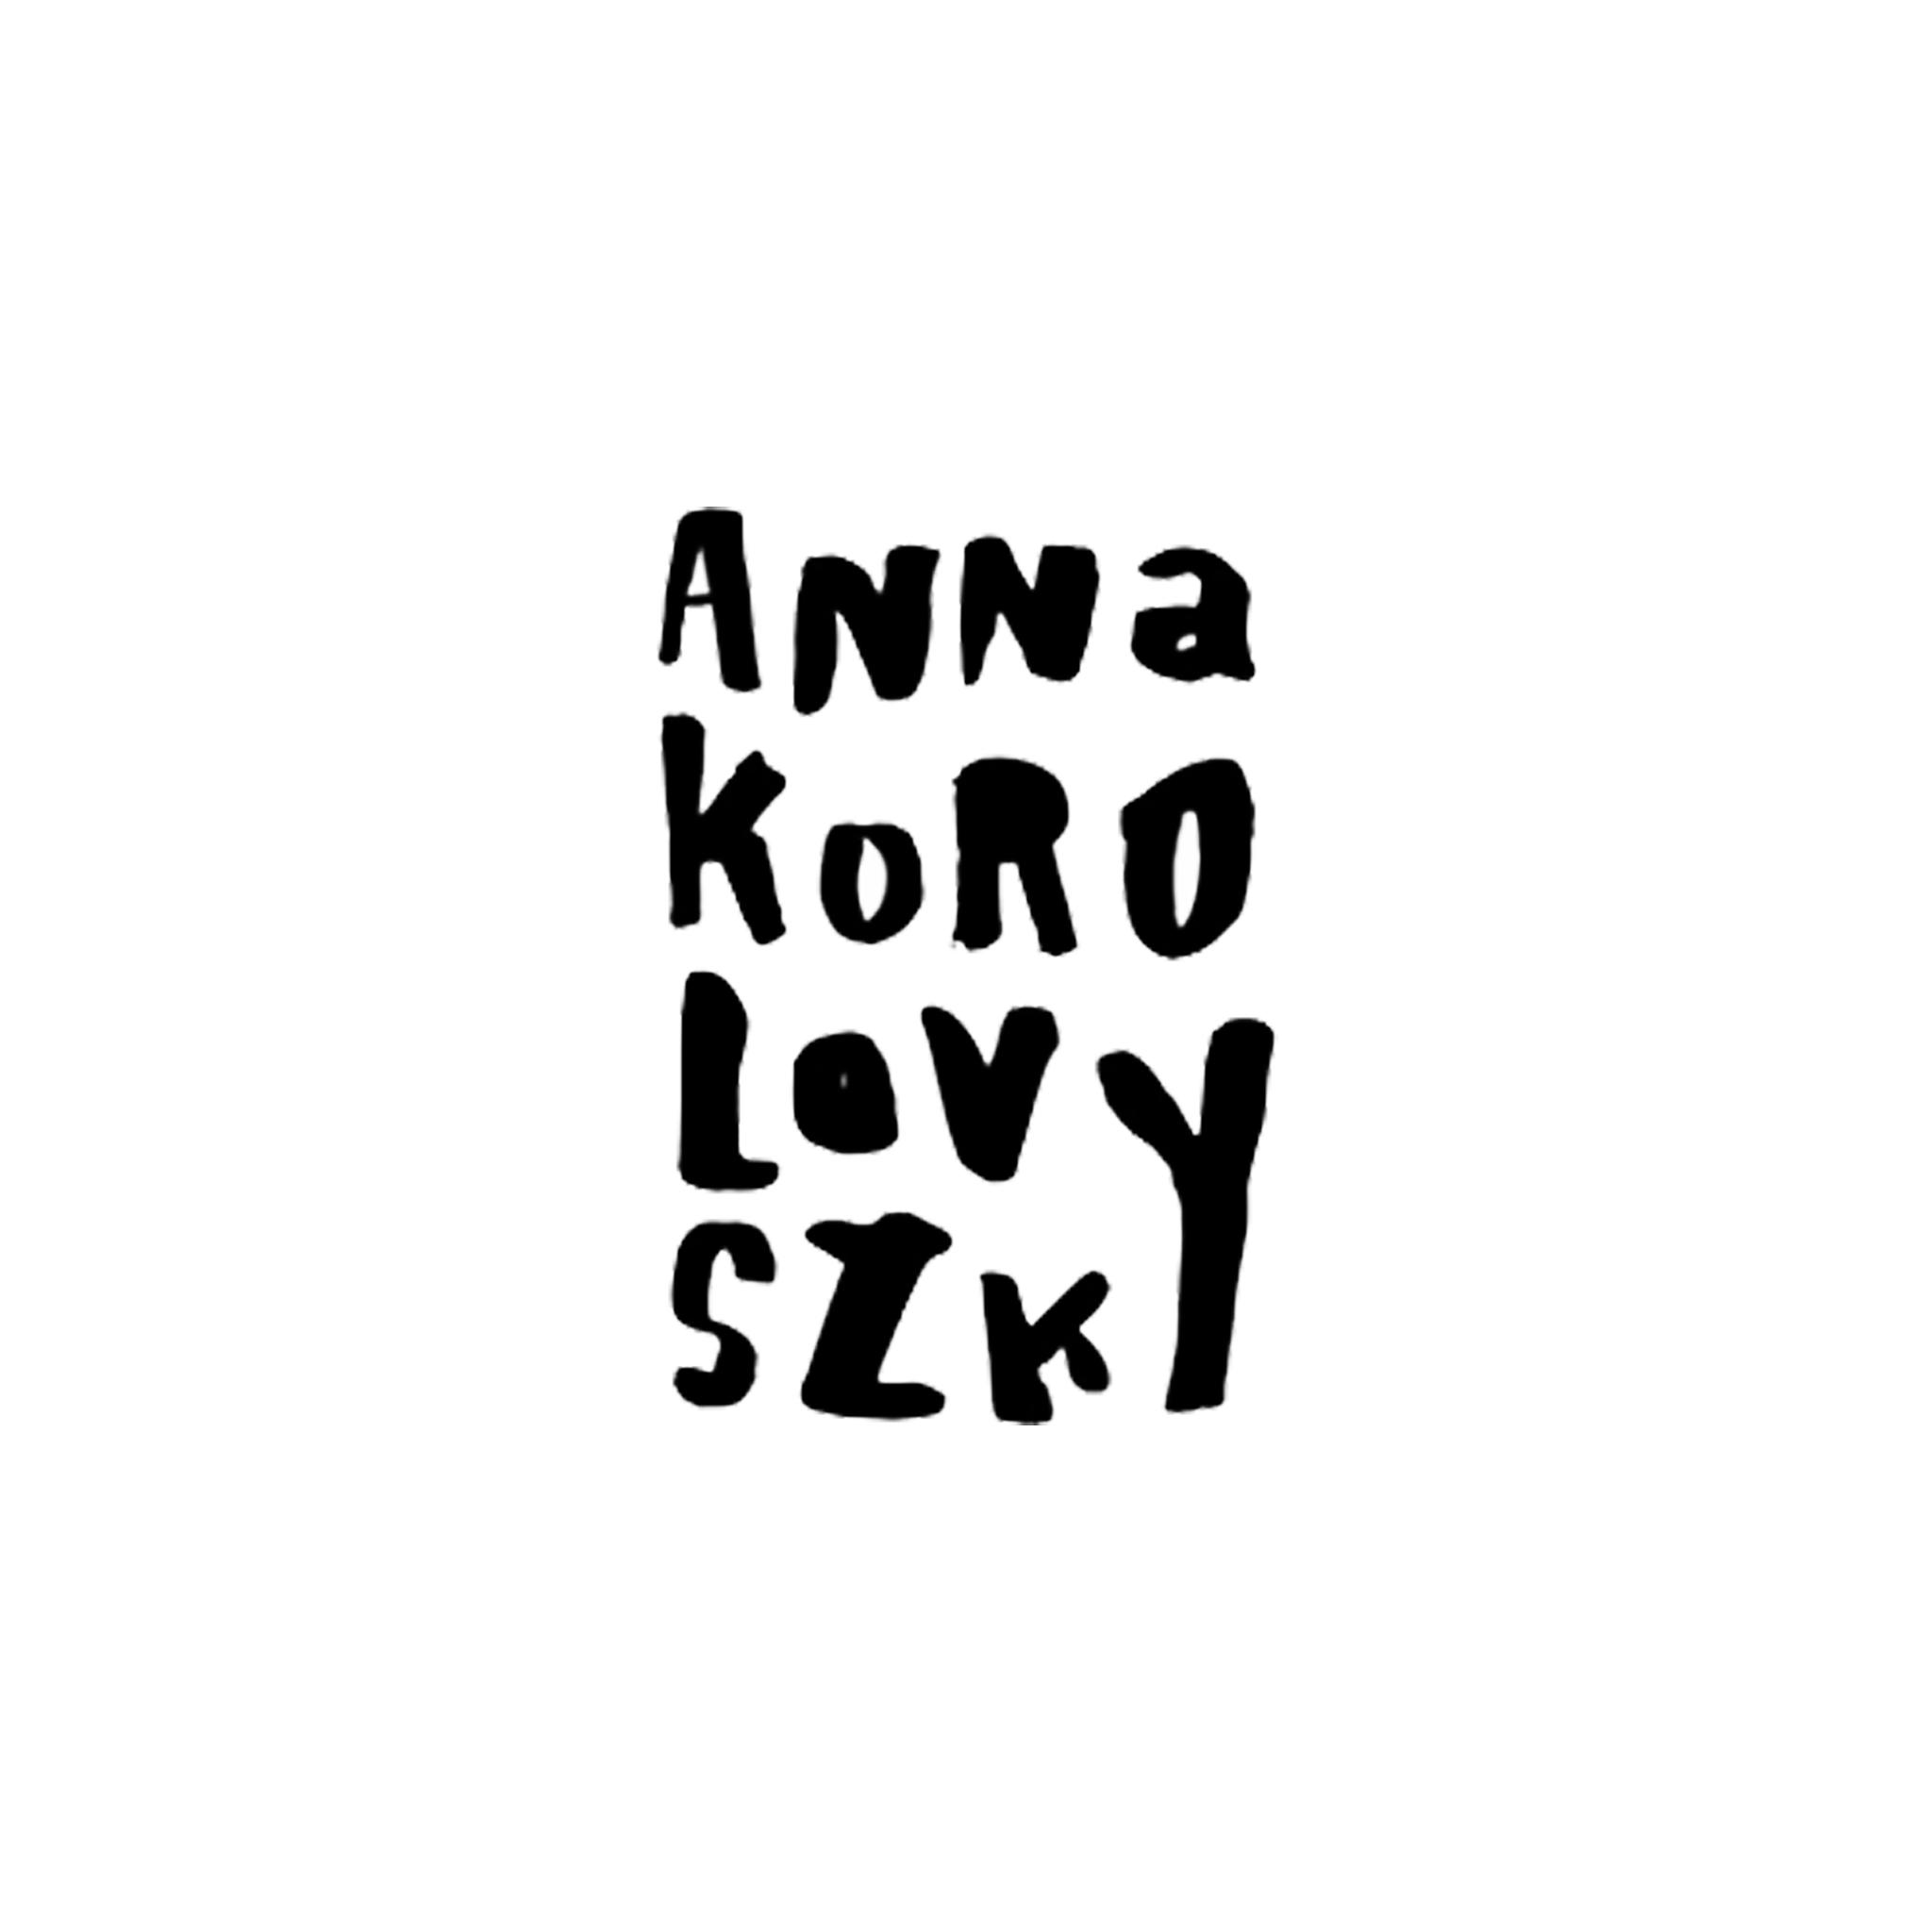 Anna Korolovszy